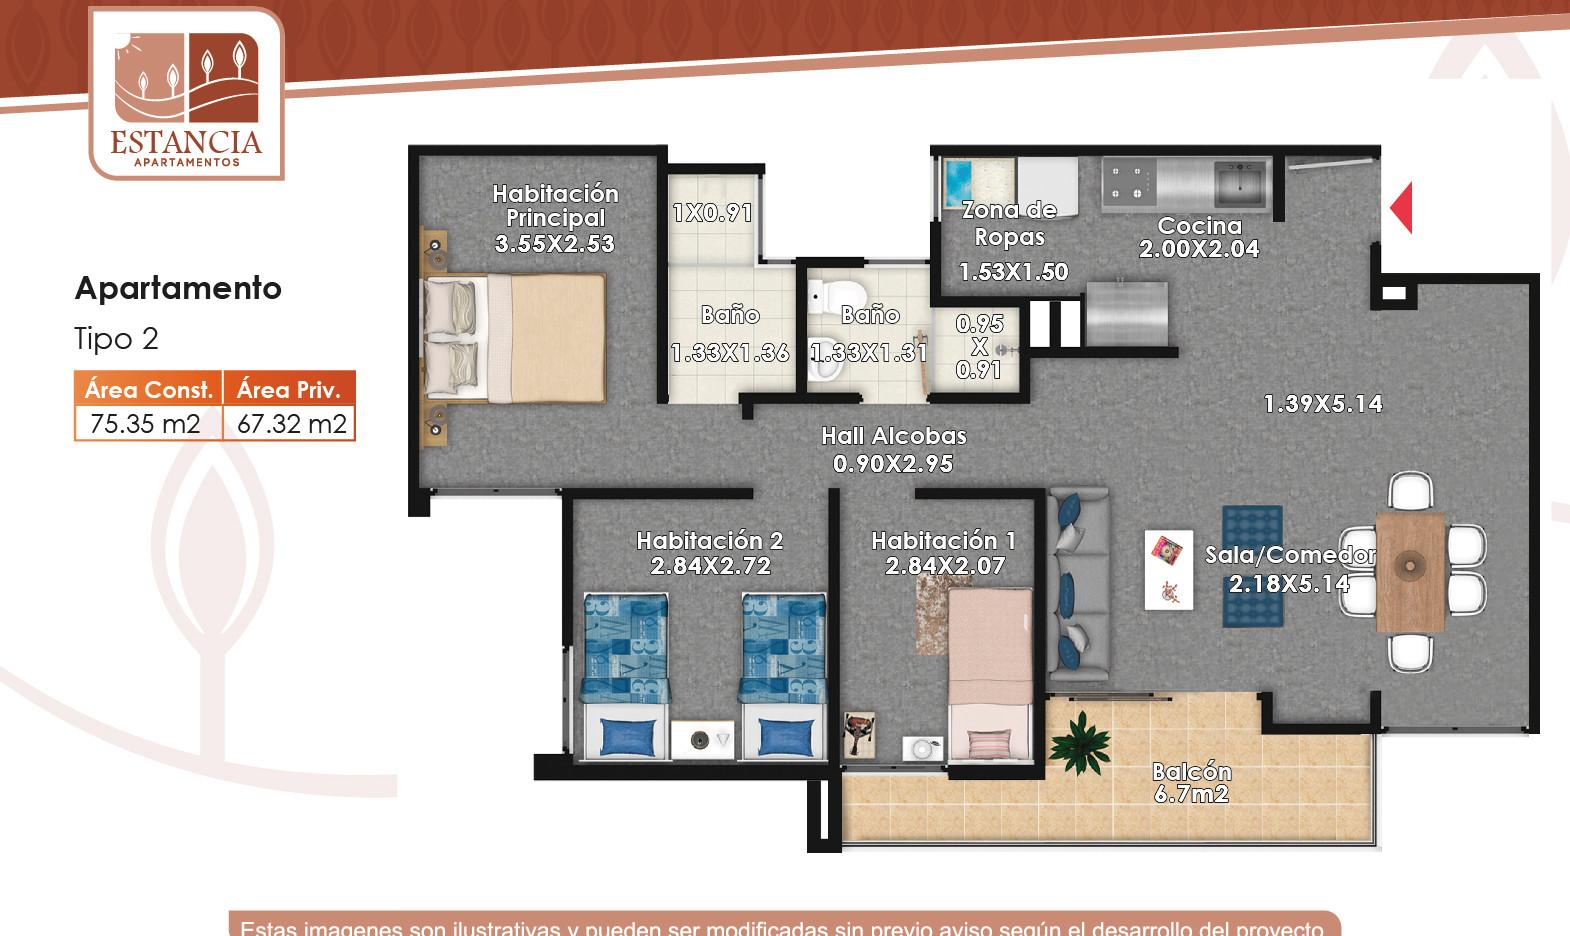 Apartamento Tipo 2